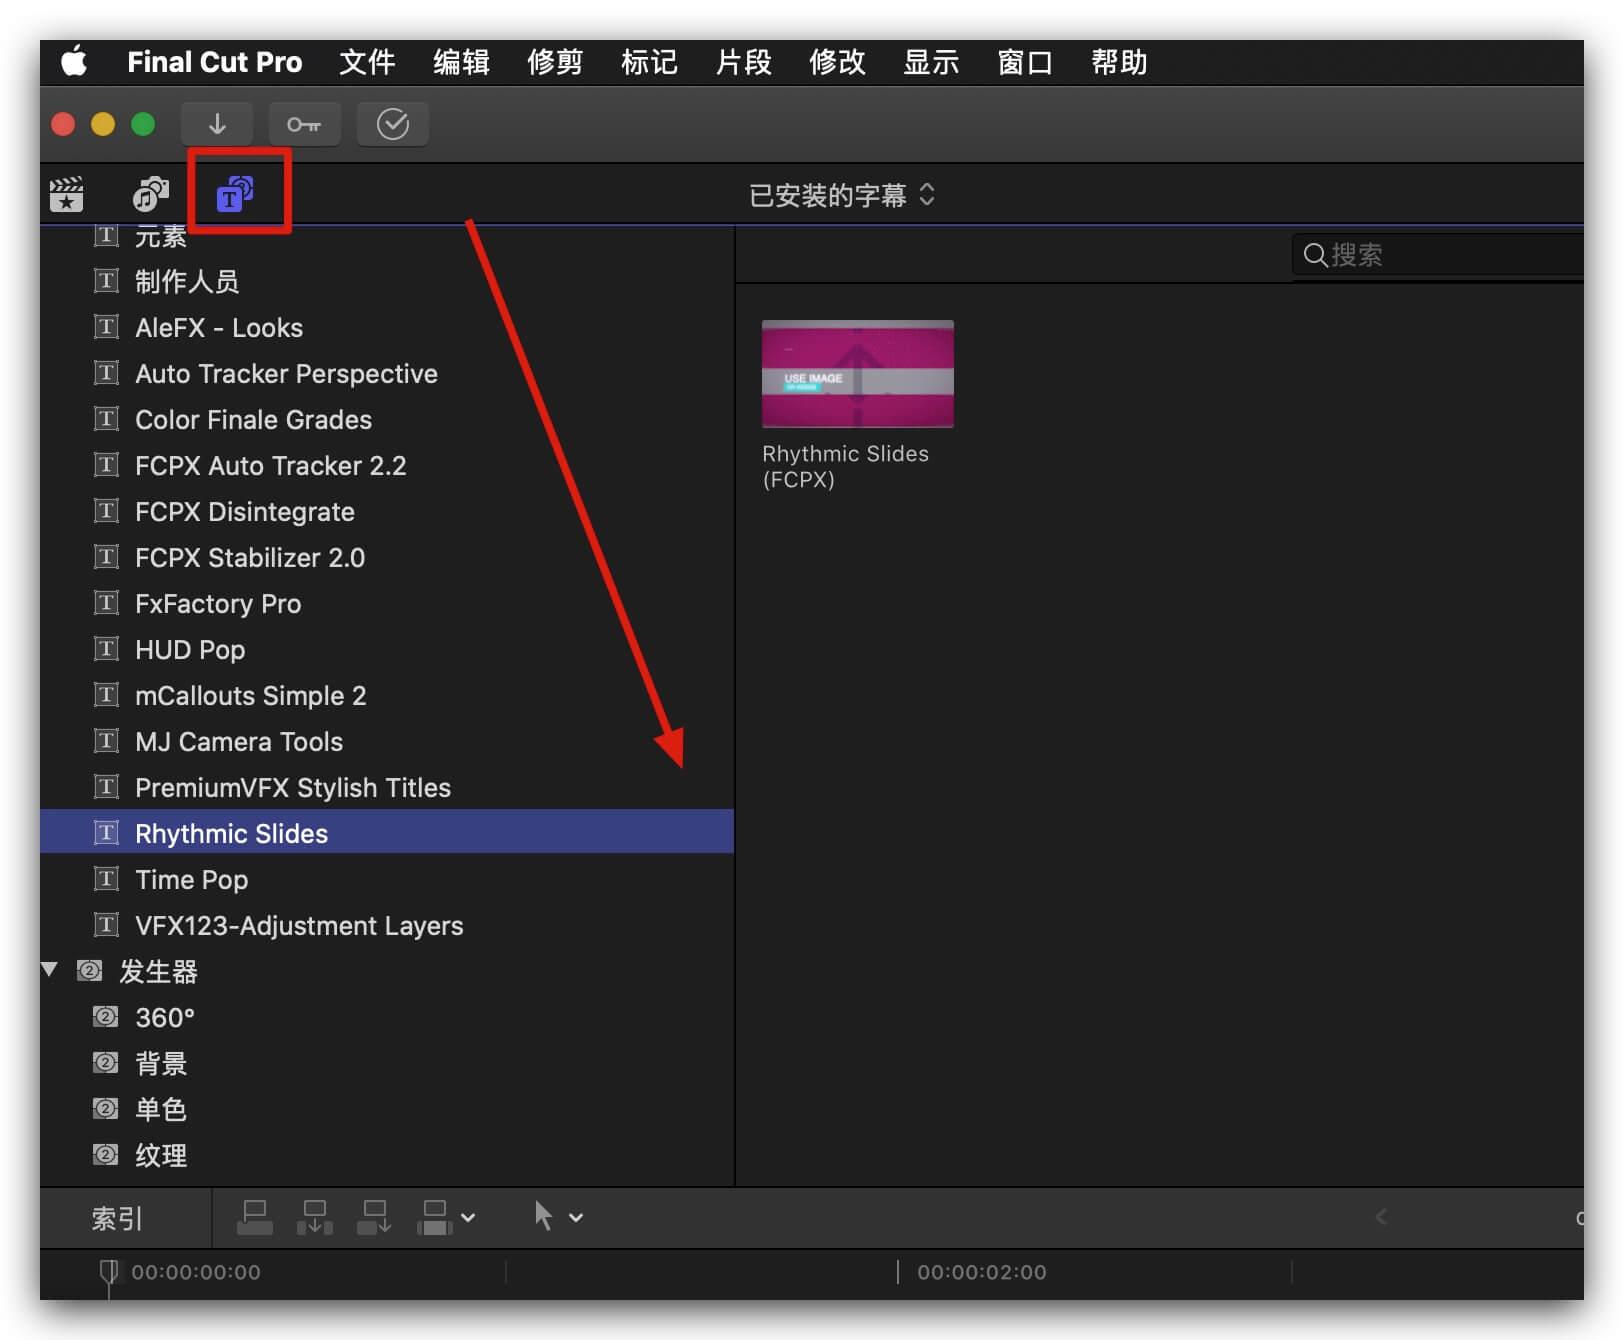 fcpx主题模板 卡点流行快速切换旅行片头 Rhythmic Slides